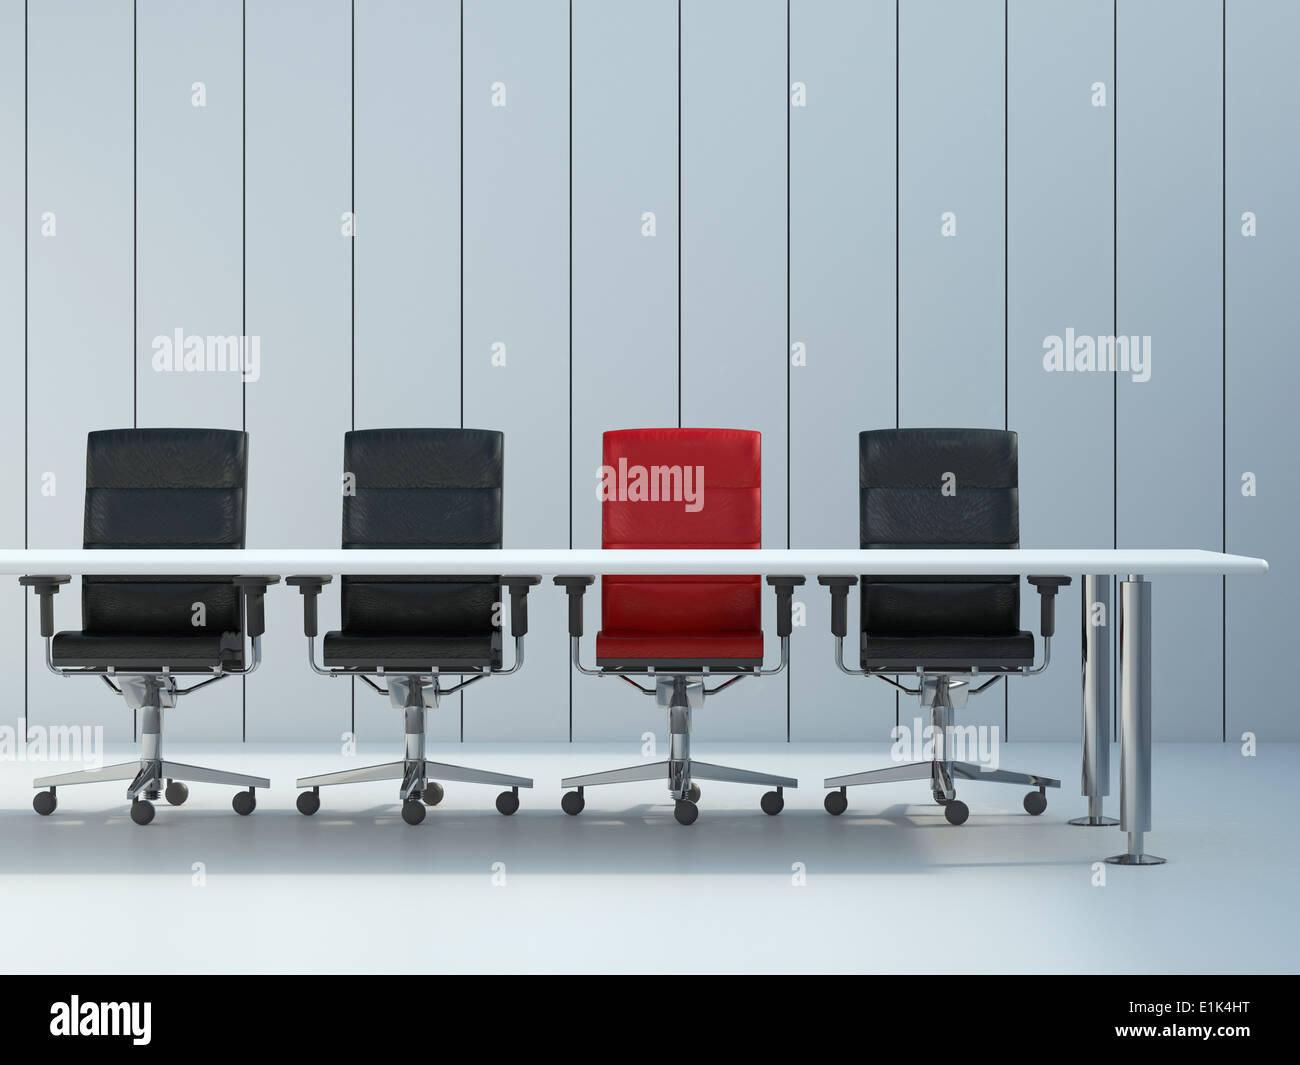 Swivel Chairs Stockfotos & Swivel Chairs Bilder - Alamy